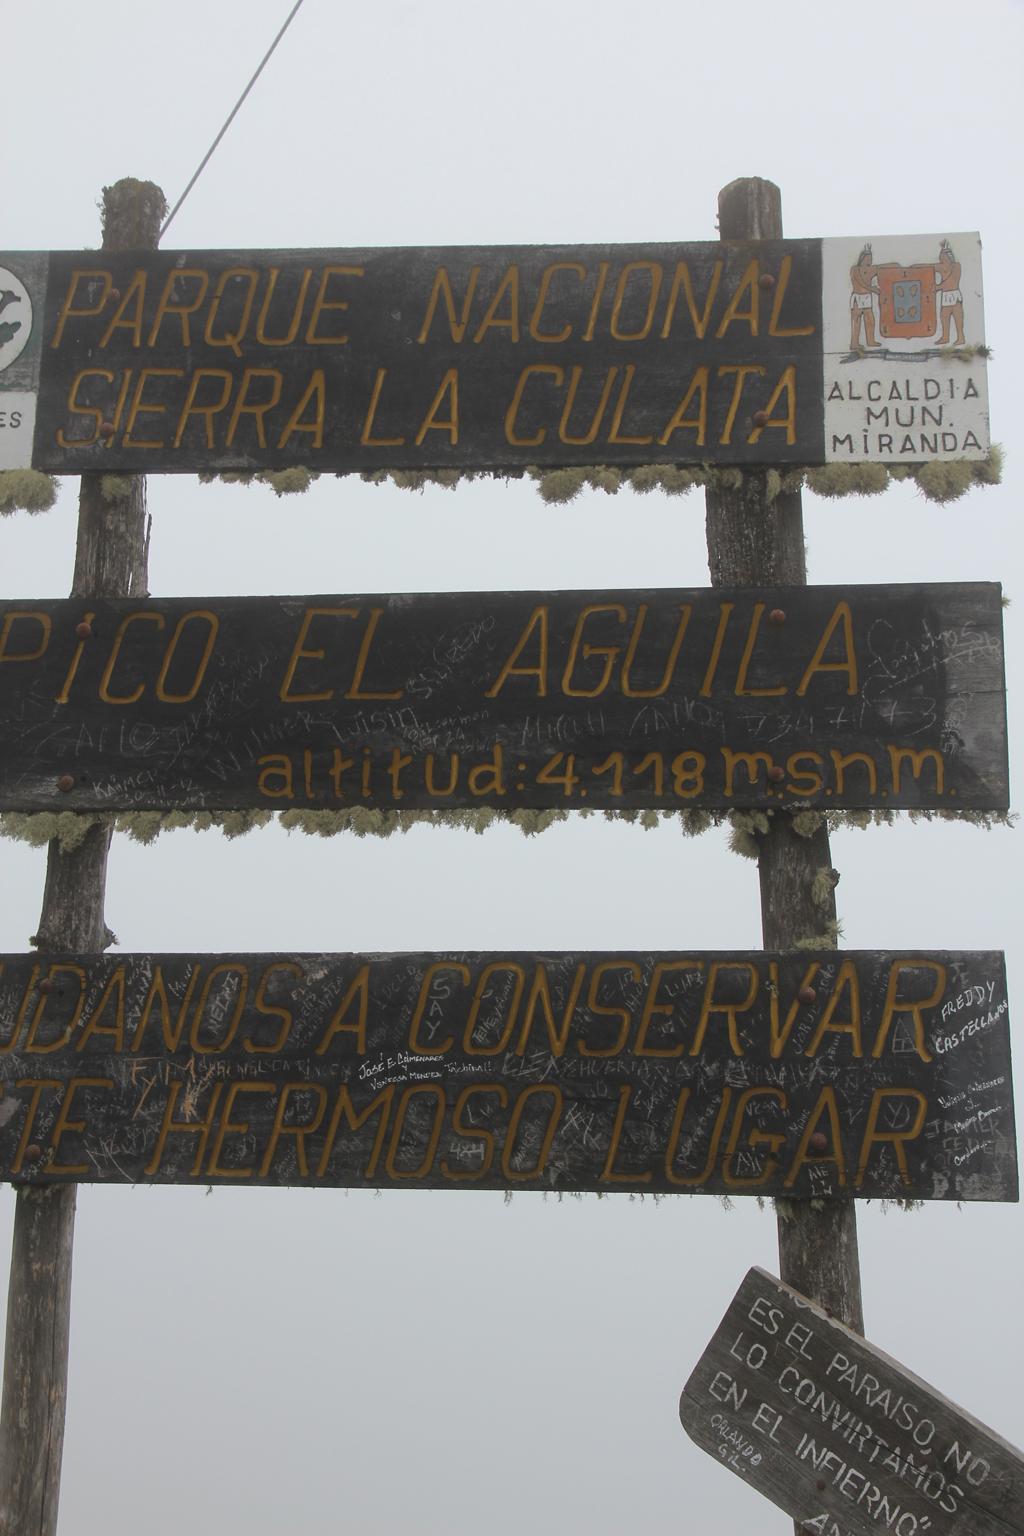 PicoAguila